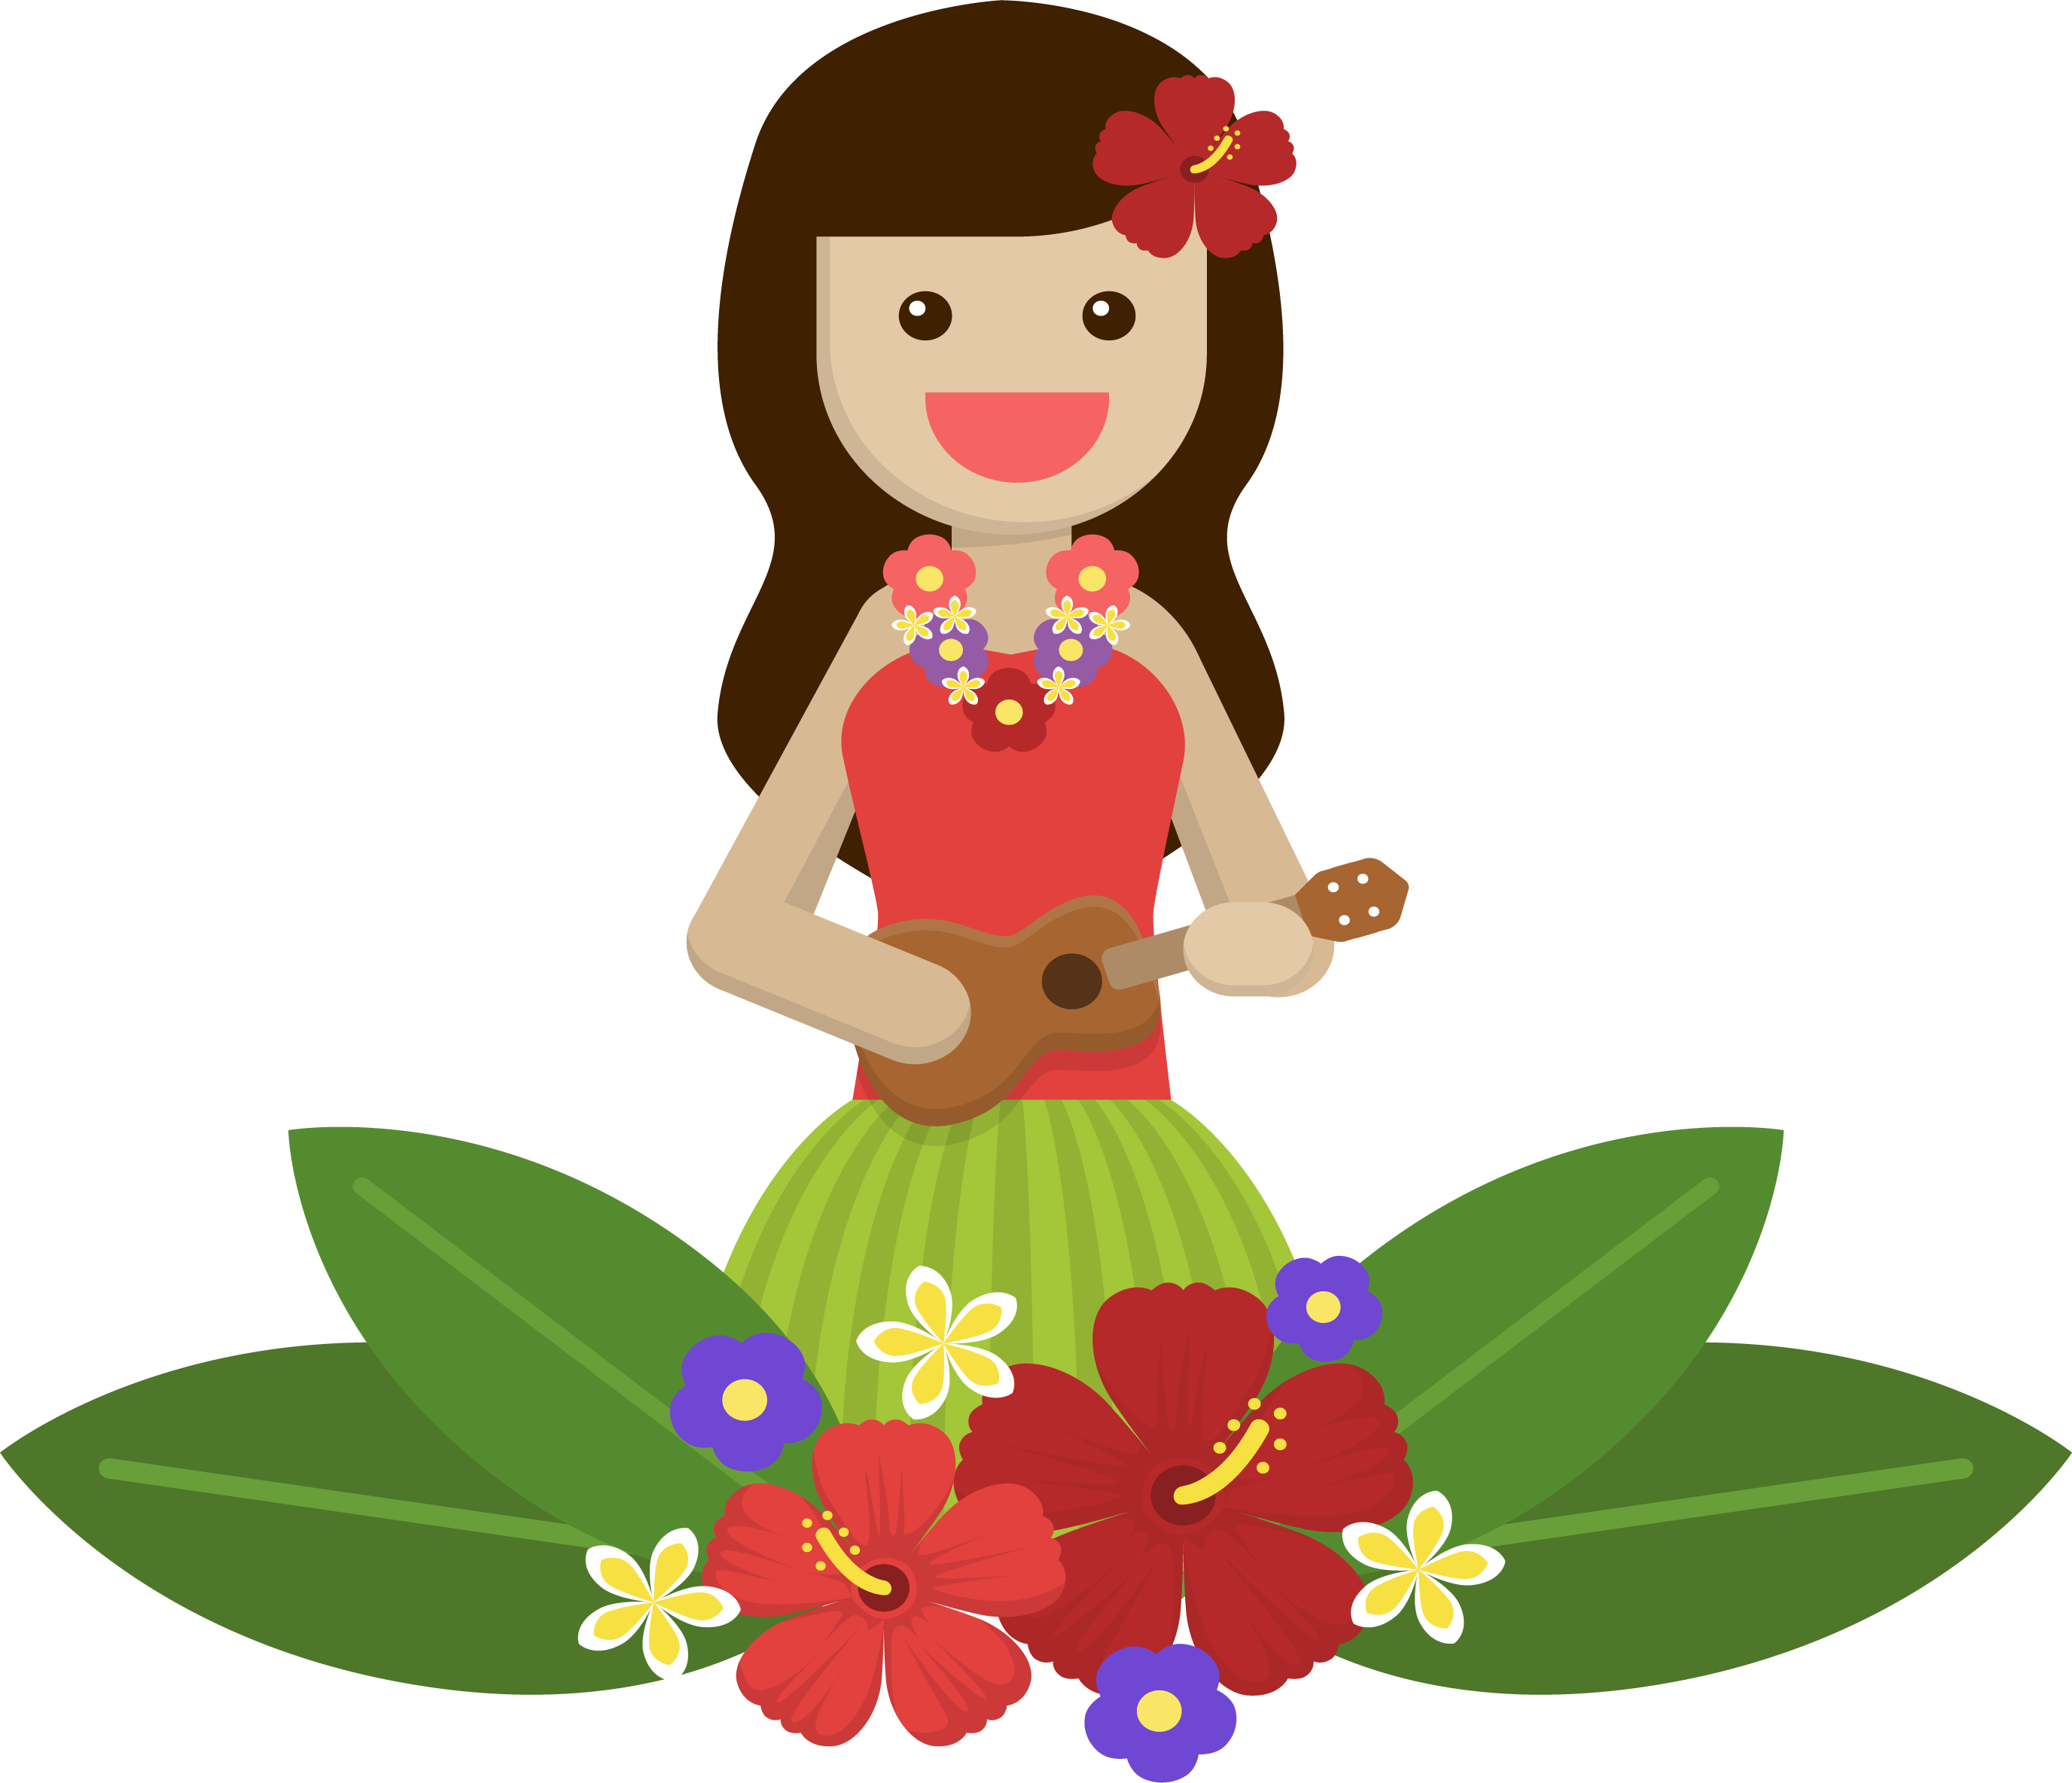 Icon island girl transprent. Mango clipart pineapple hawaii